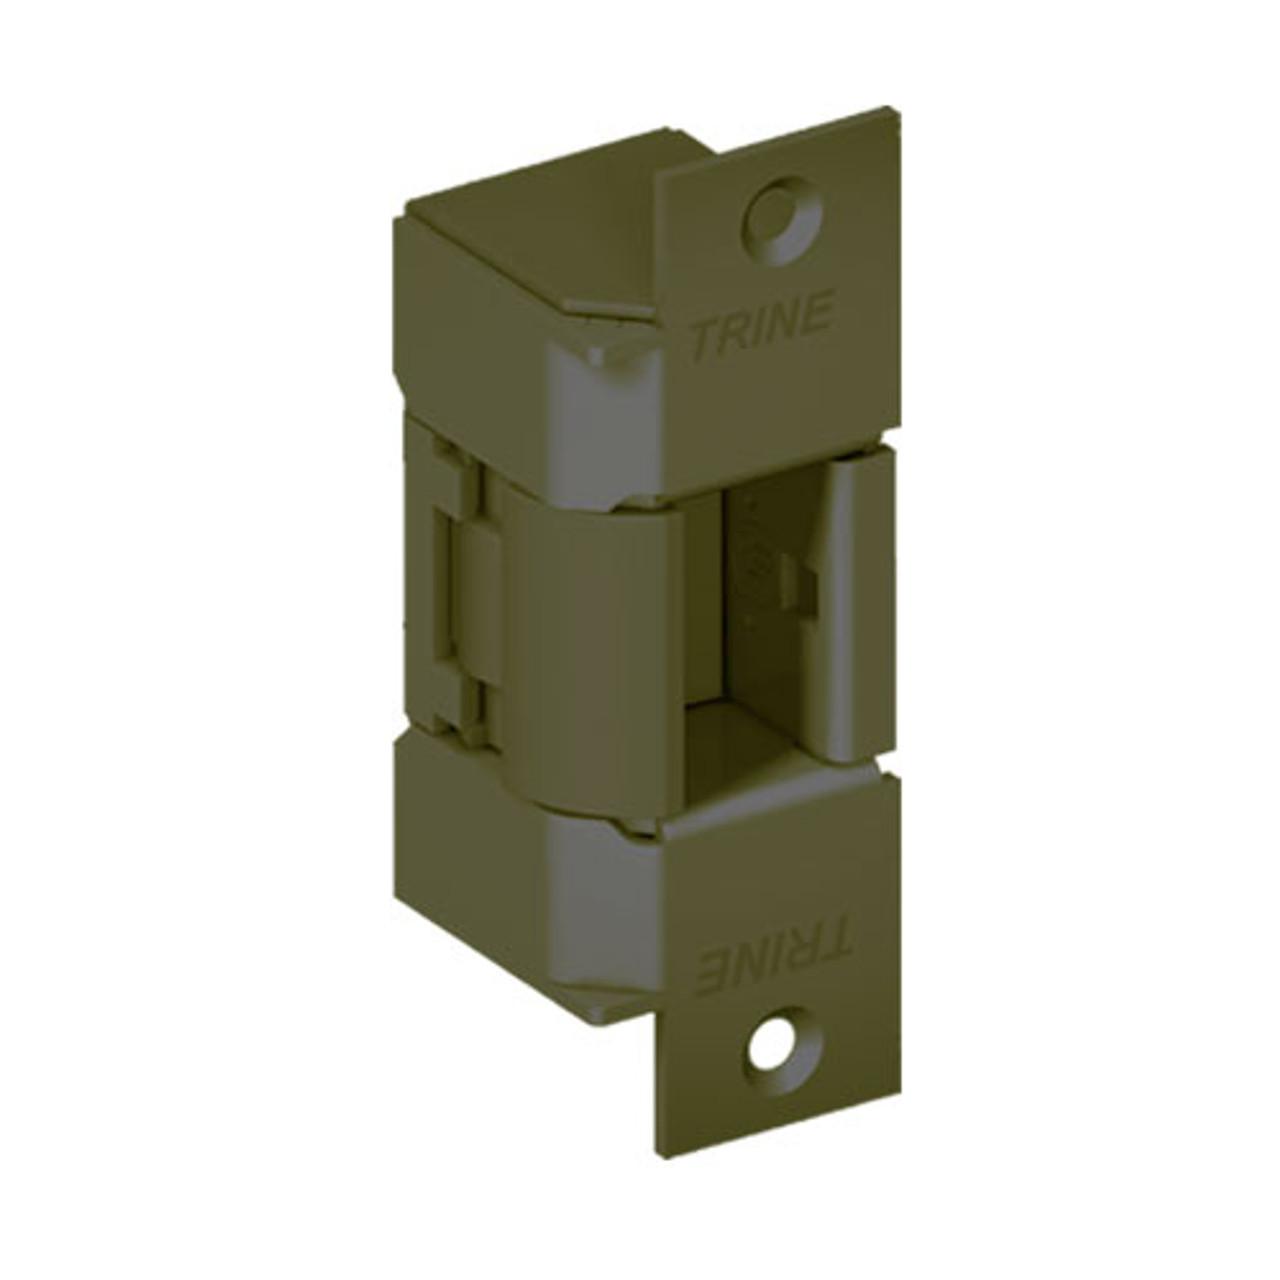 EN400-24DC-US10B-LH Trine EN Series Outdoor Electric Strikes Solution in Dark Bronze Finish